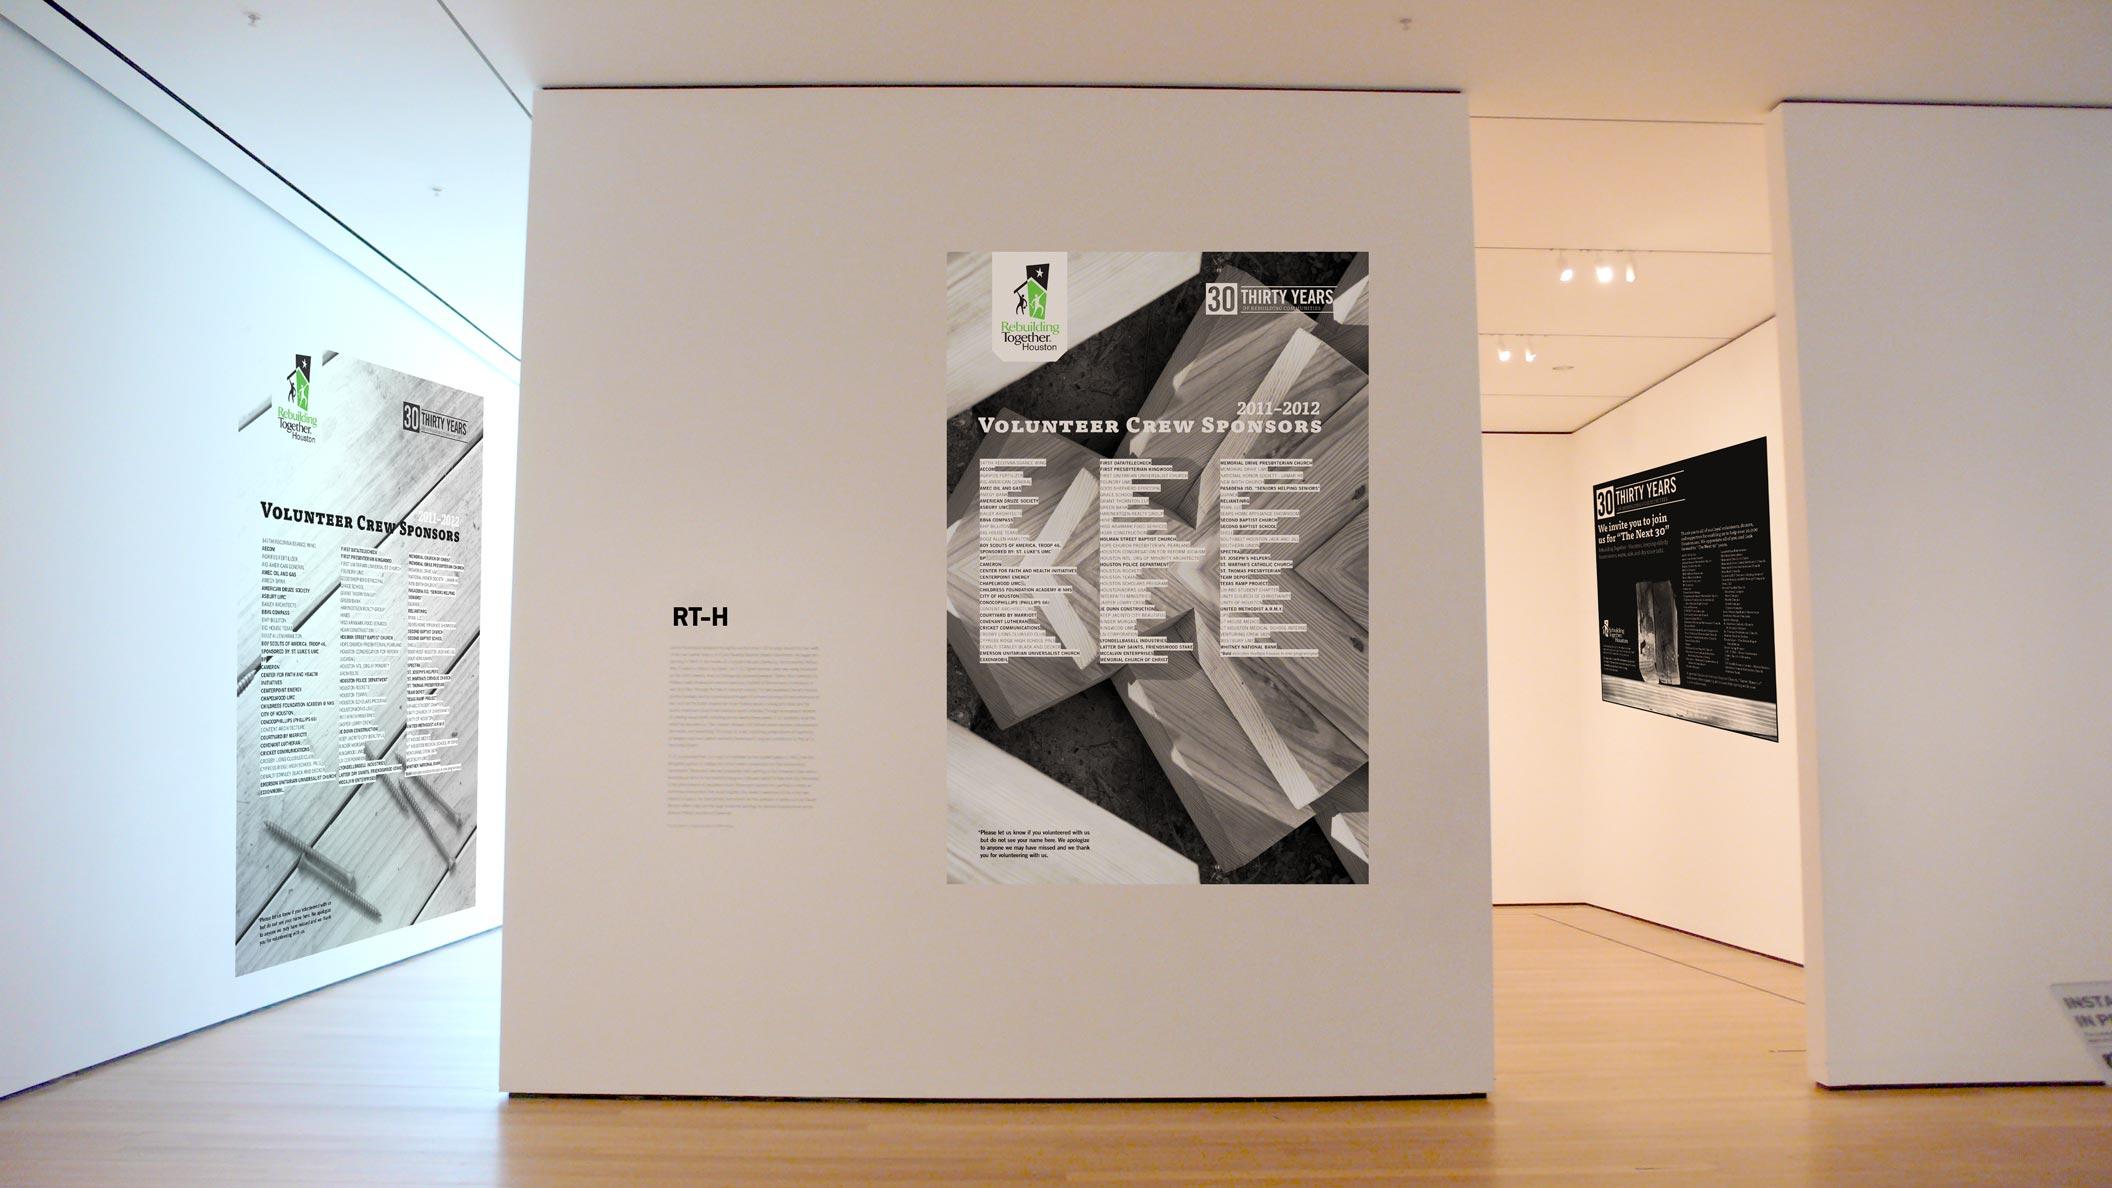 exhibit-rth.jpg